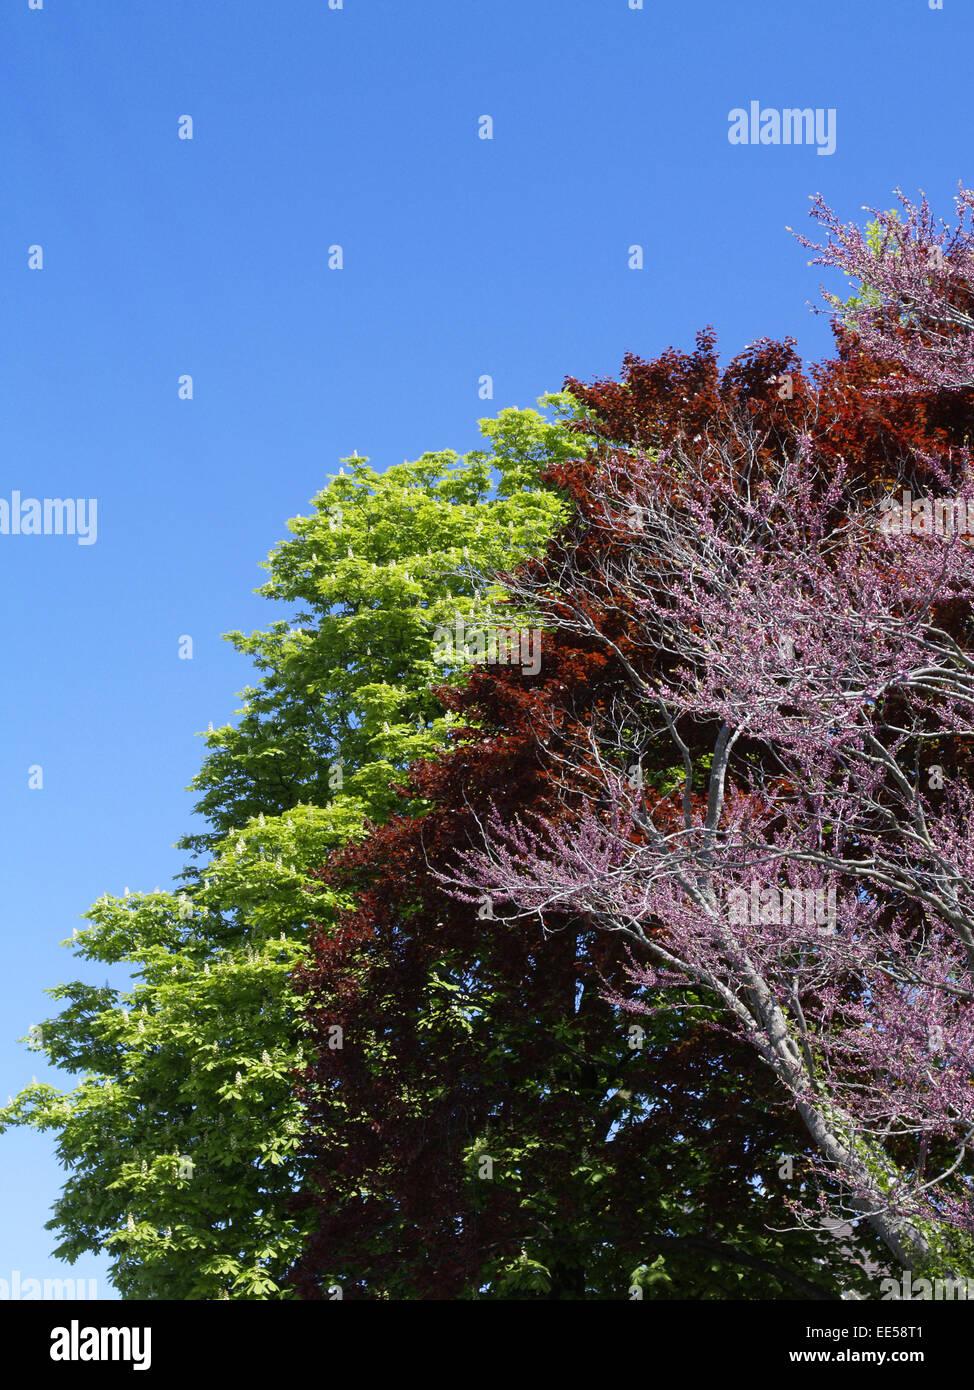 bluehender Baum im Fruehling, Baumbluete, farbig, bunt, rosa, rot, blauer Himmel, gruene Blaetter - Stock Image